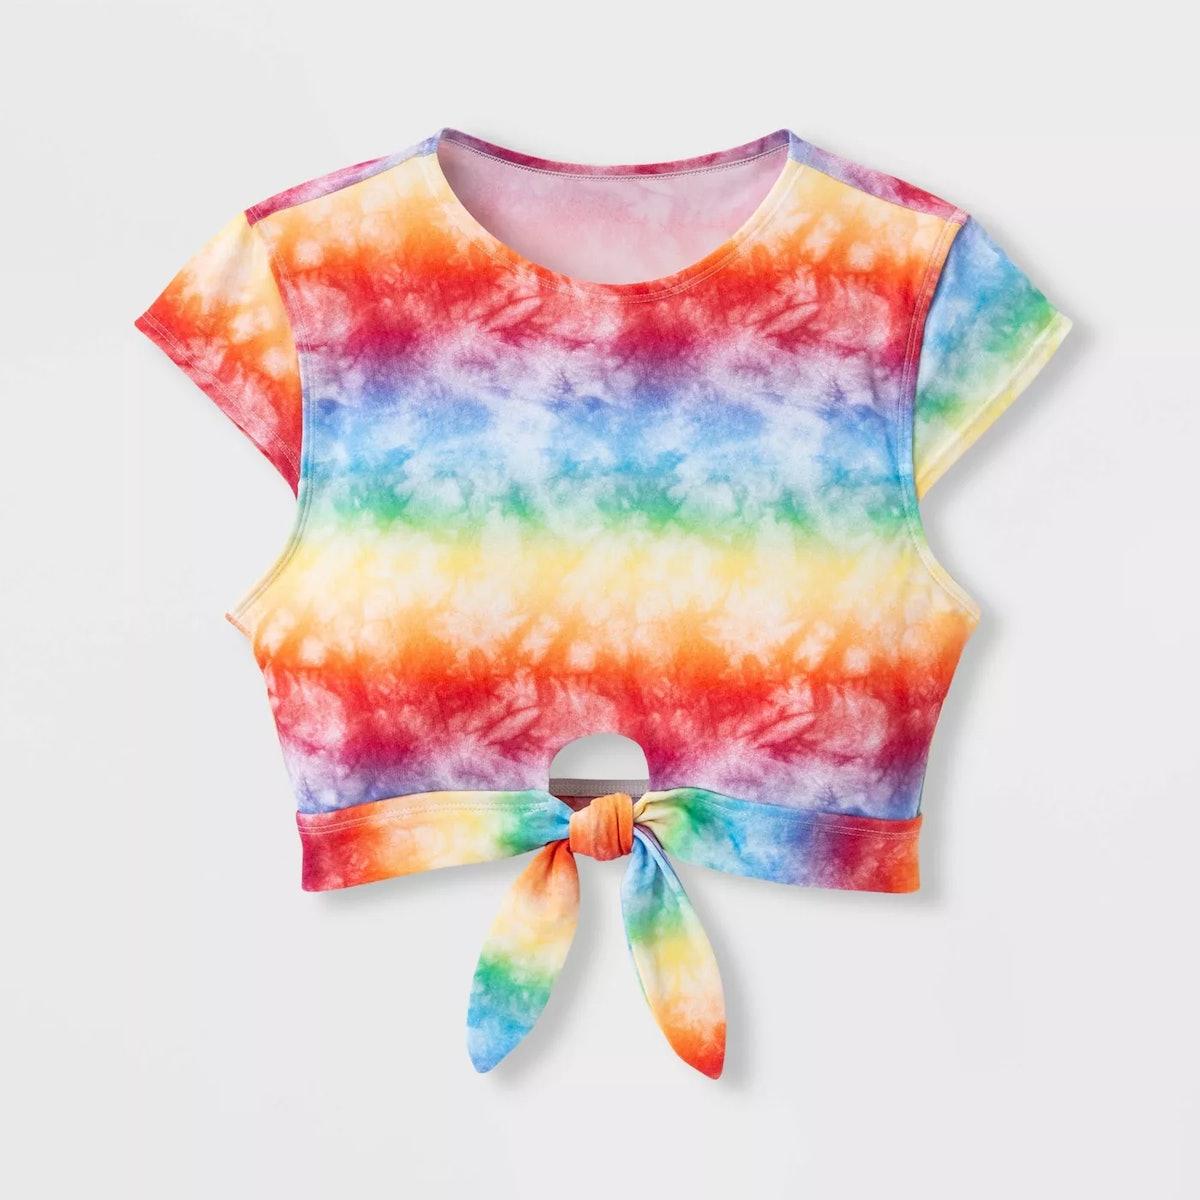 Sirena Pride Gender Inclusive Adult Rainbow Tie-Dye Crop Swim Top